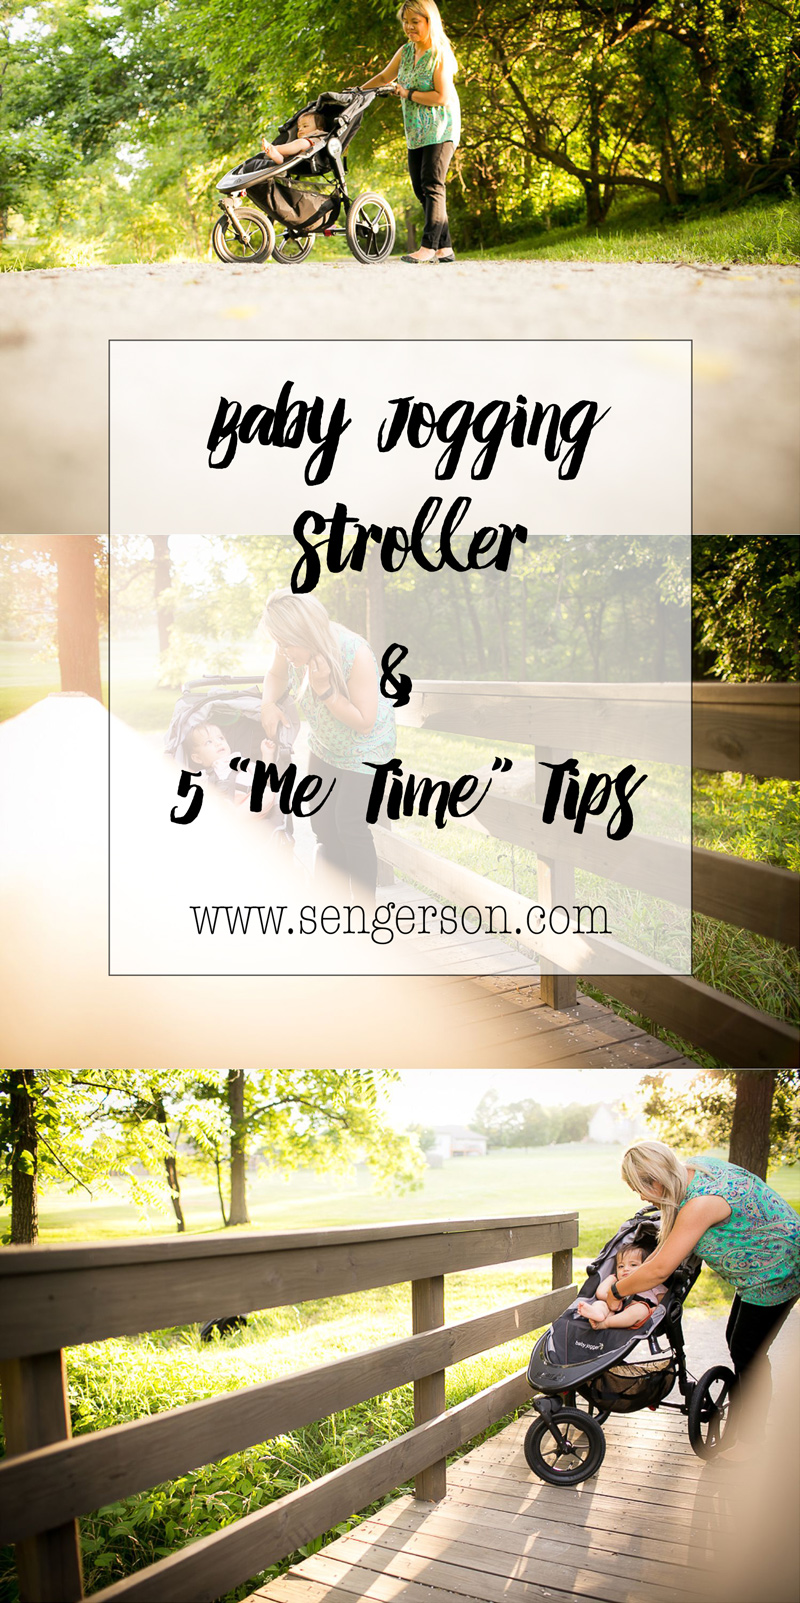 Baby Jogging Stroller